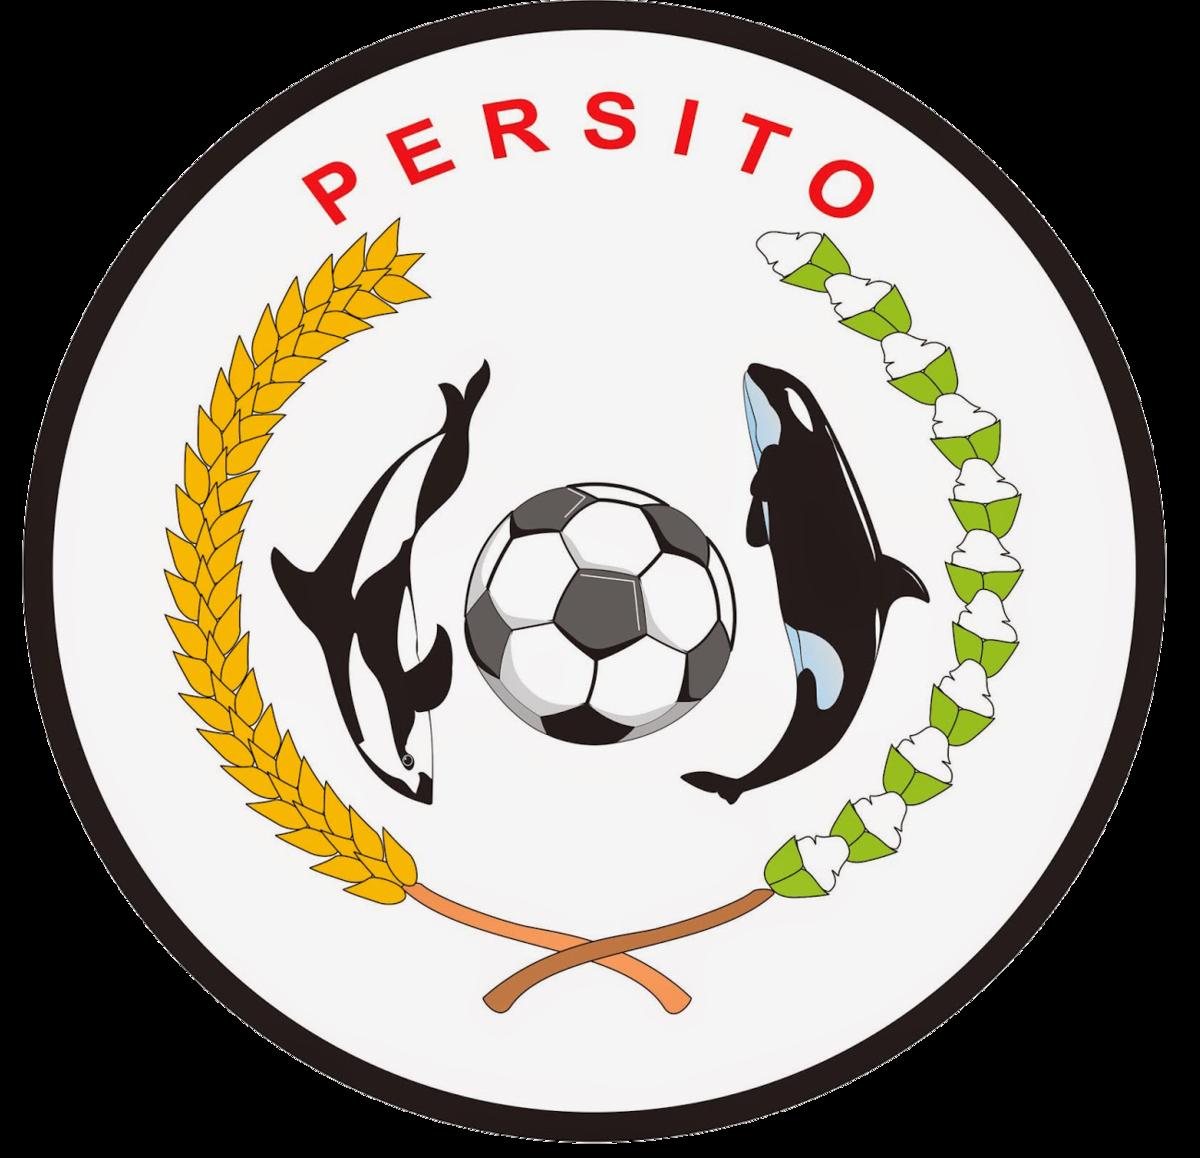 Persito Tolitoli Wikipedia Bahasa Indonesia Ensiklopedia Bebas